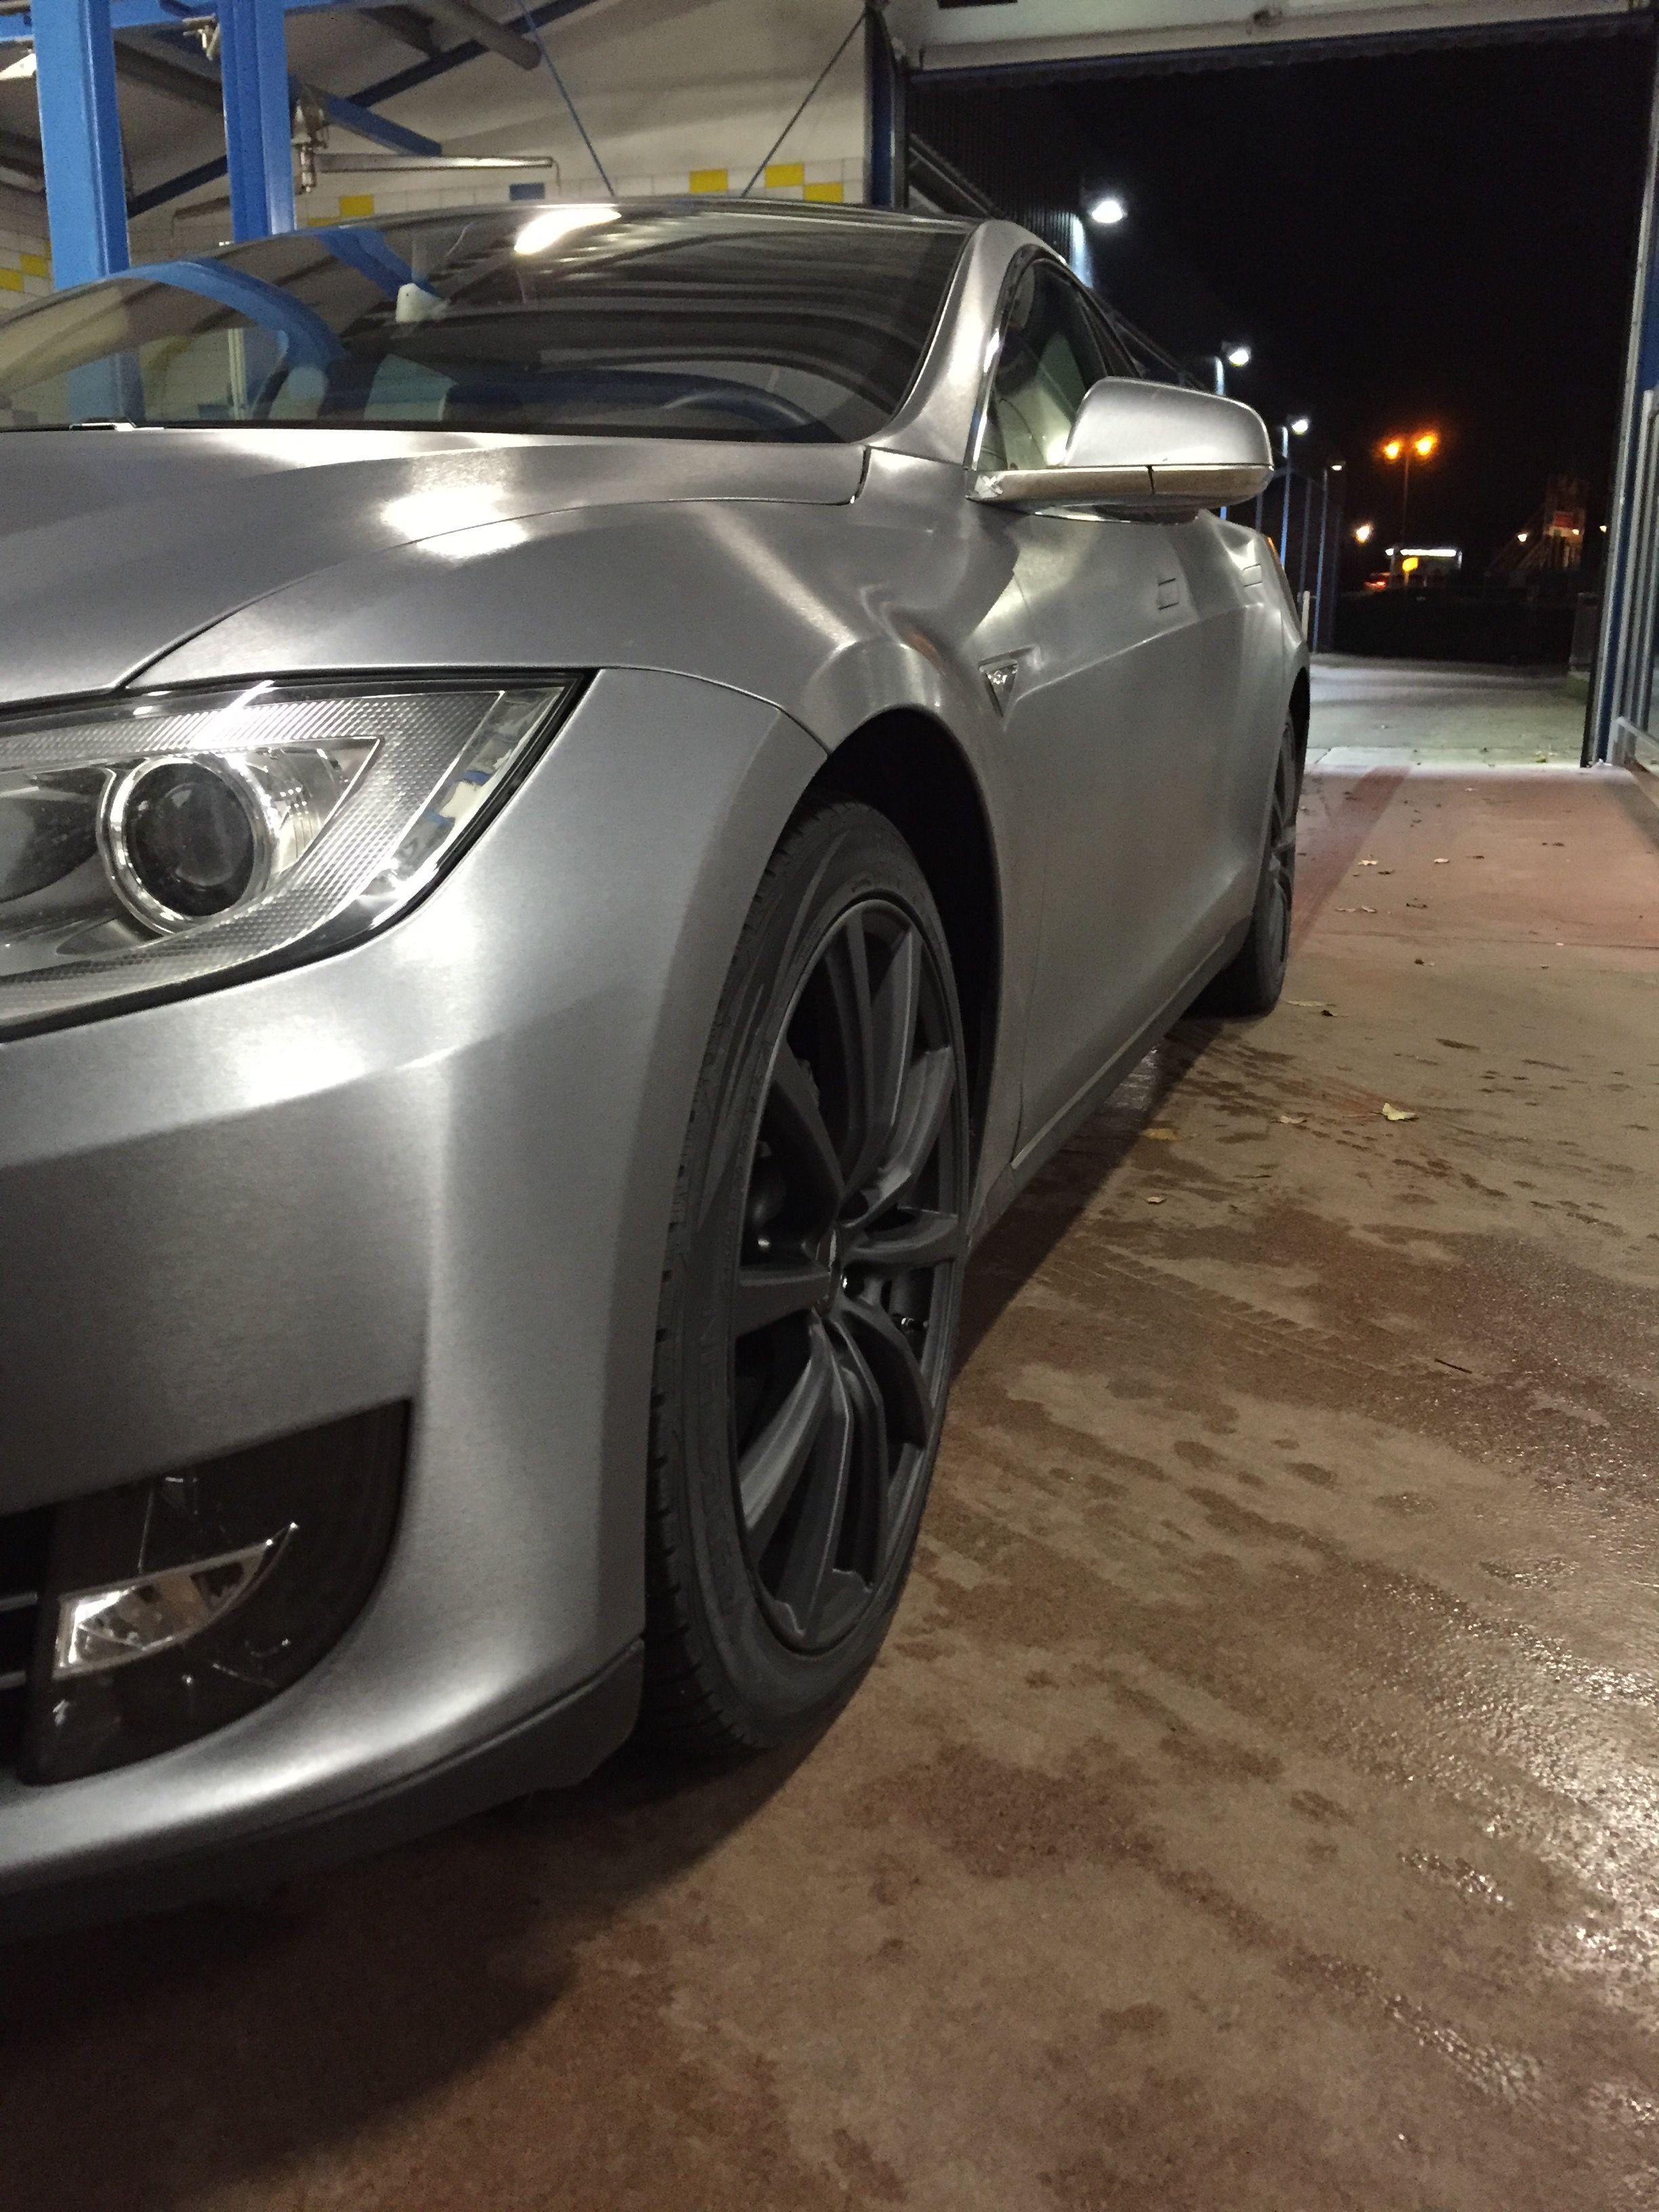 Tesla Model S Brushed Aluminium Wrap Car Wrap Tesla Model S Brushed Aluminum